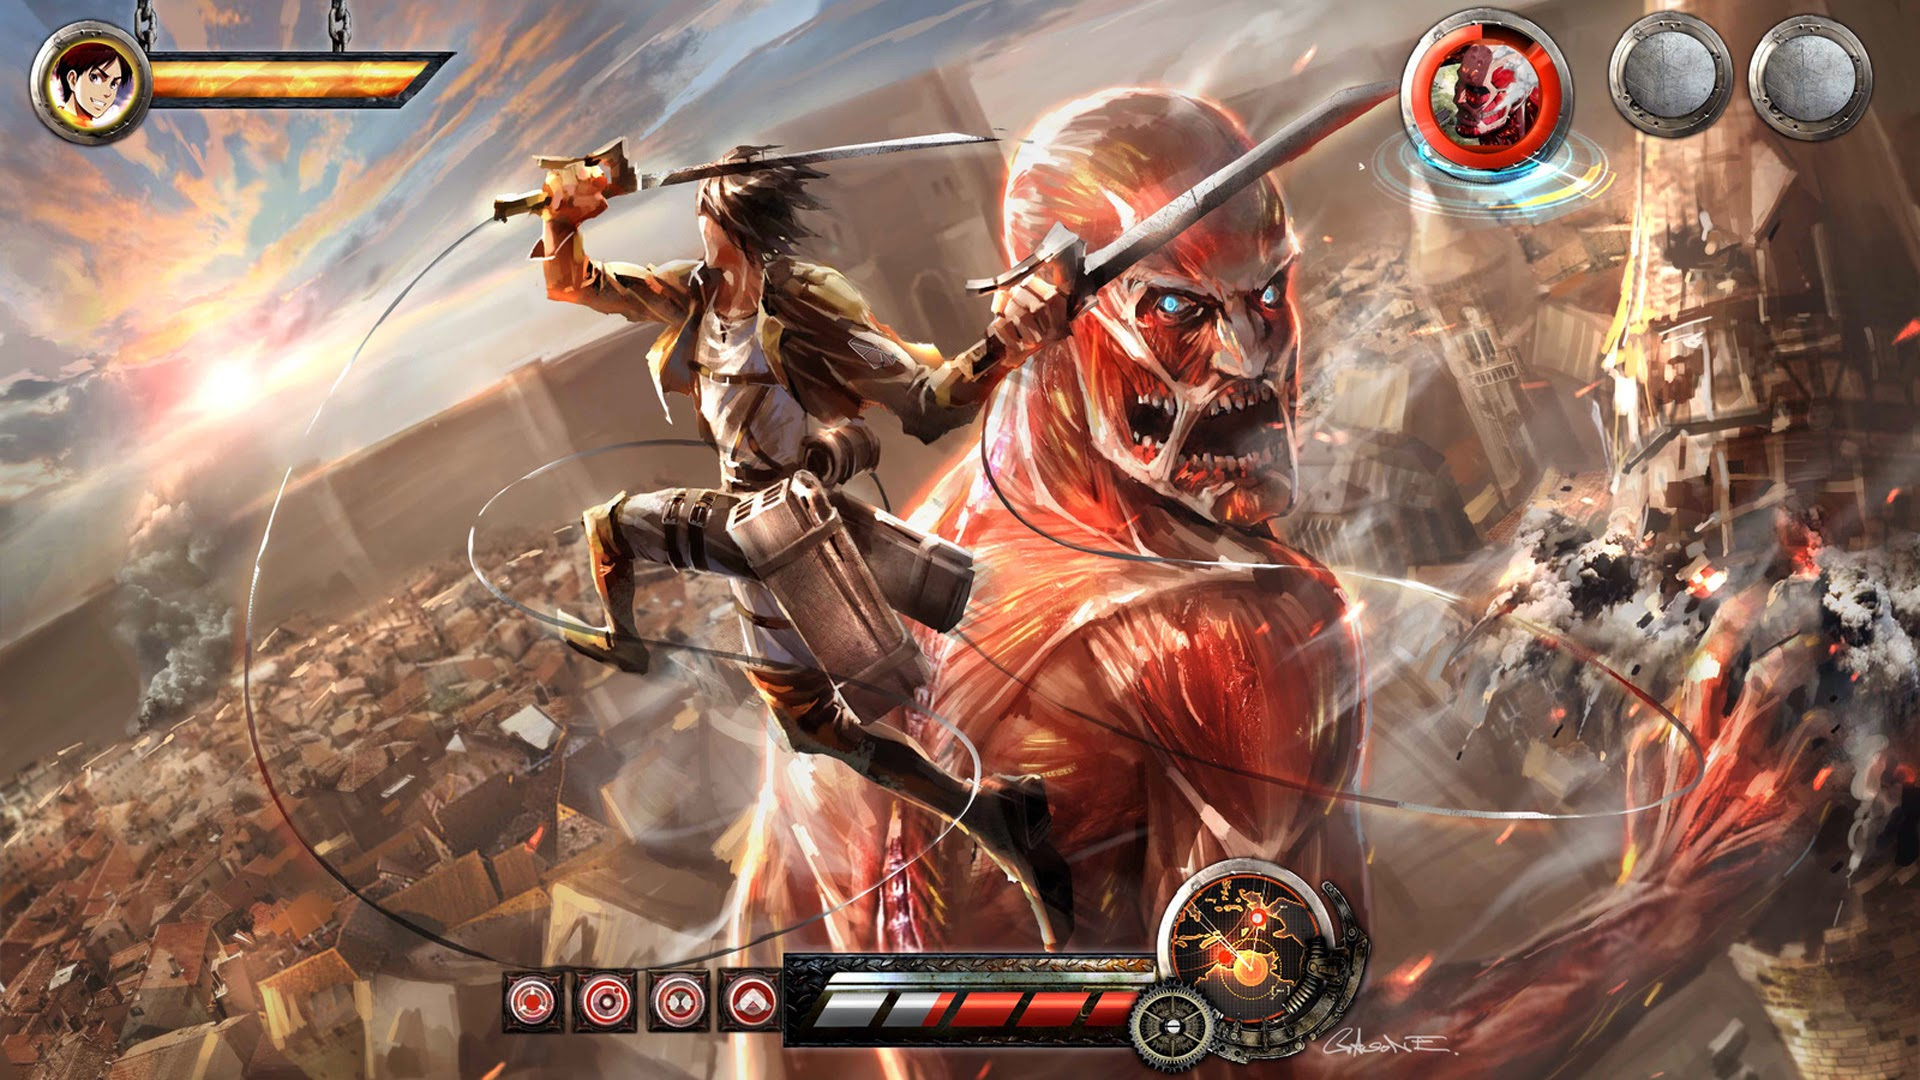 Attack on Titan Game Theme 55 Wallpaper HD